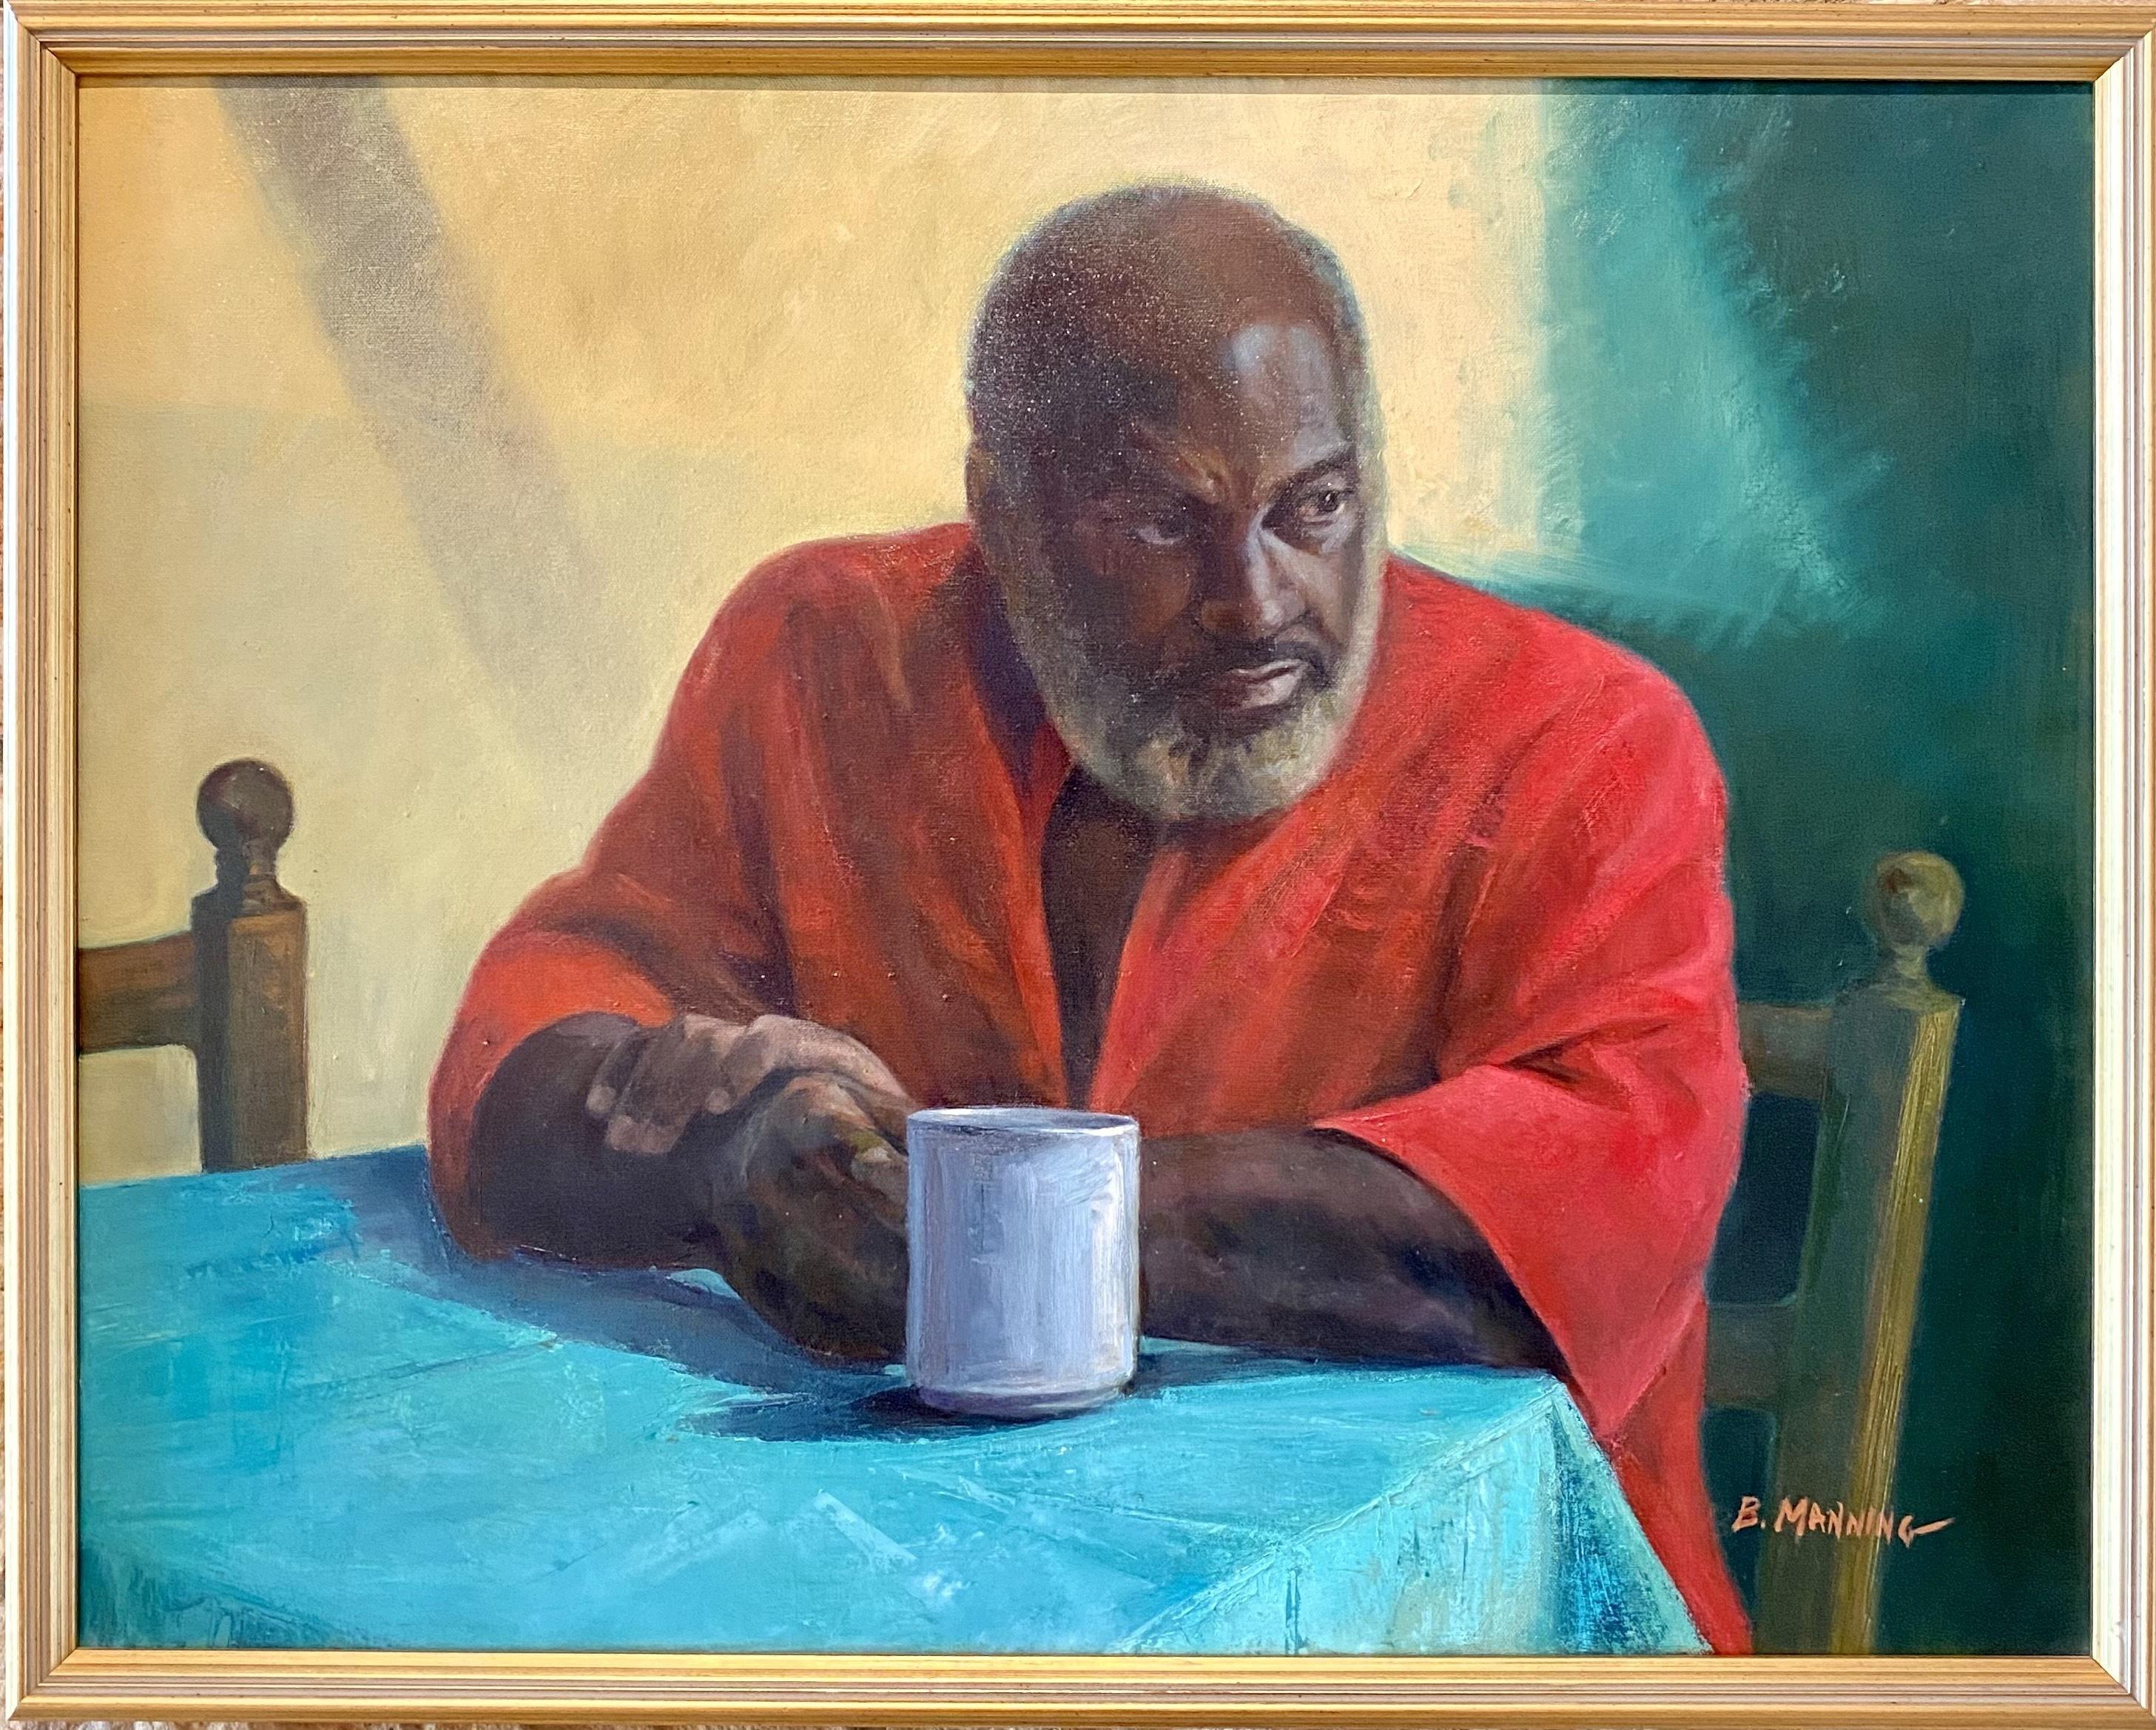 Brenda Manning, <i> Dave (Coffee Break)</i>, 1991, Oil on canvas, Gift of the artist